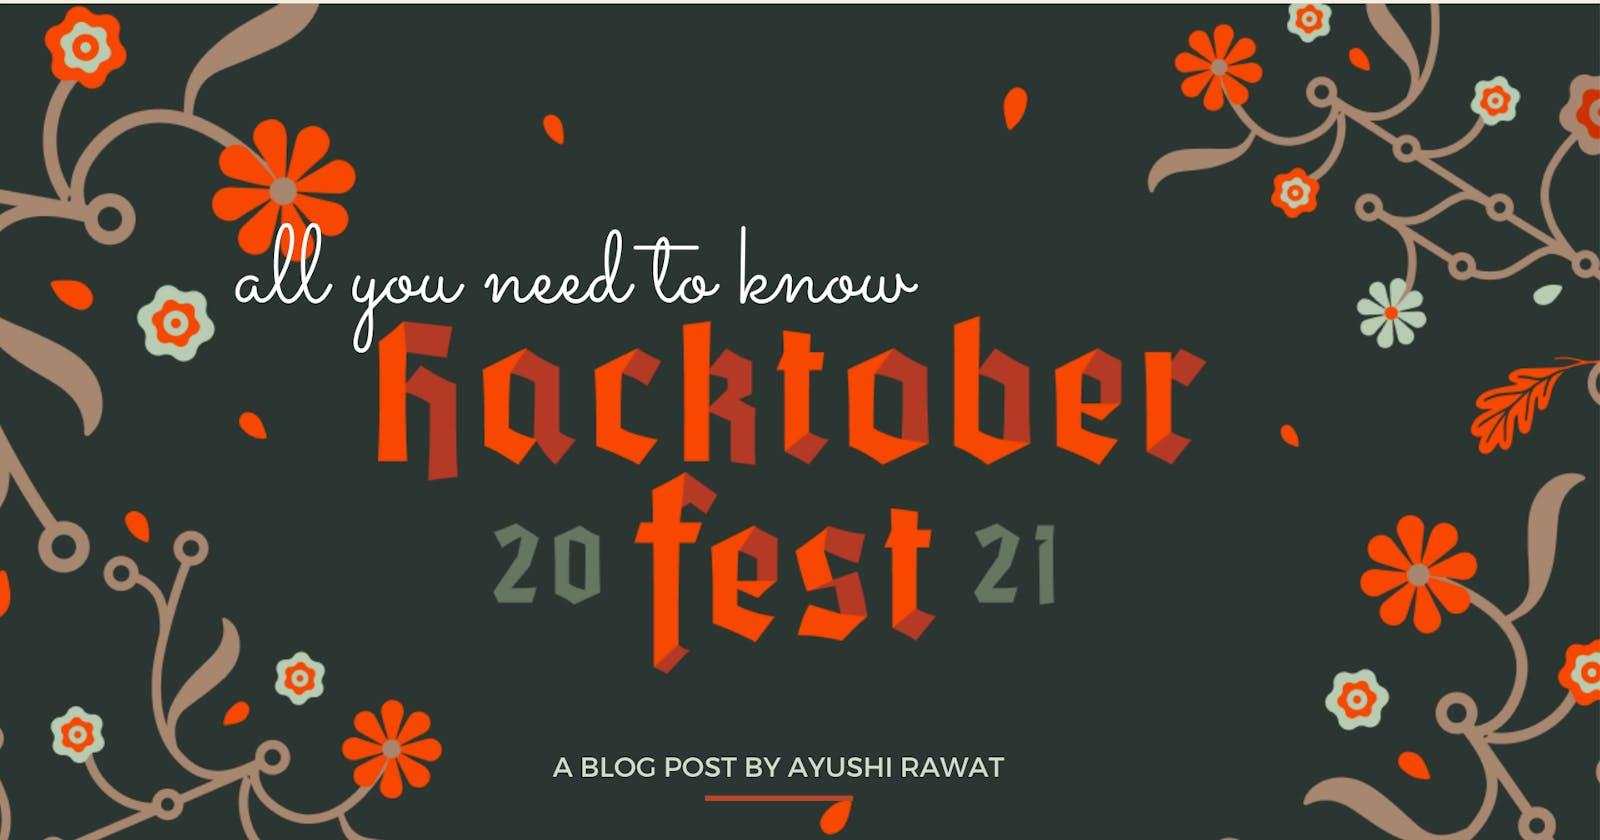 Beginner's guide to Hacktoberfest 2021